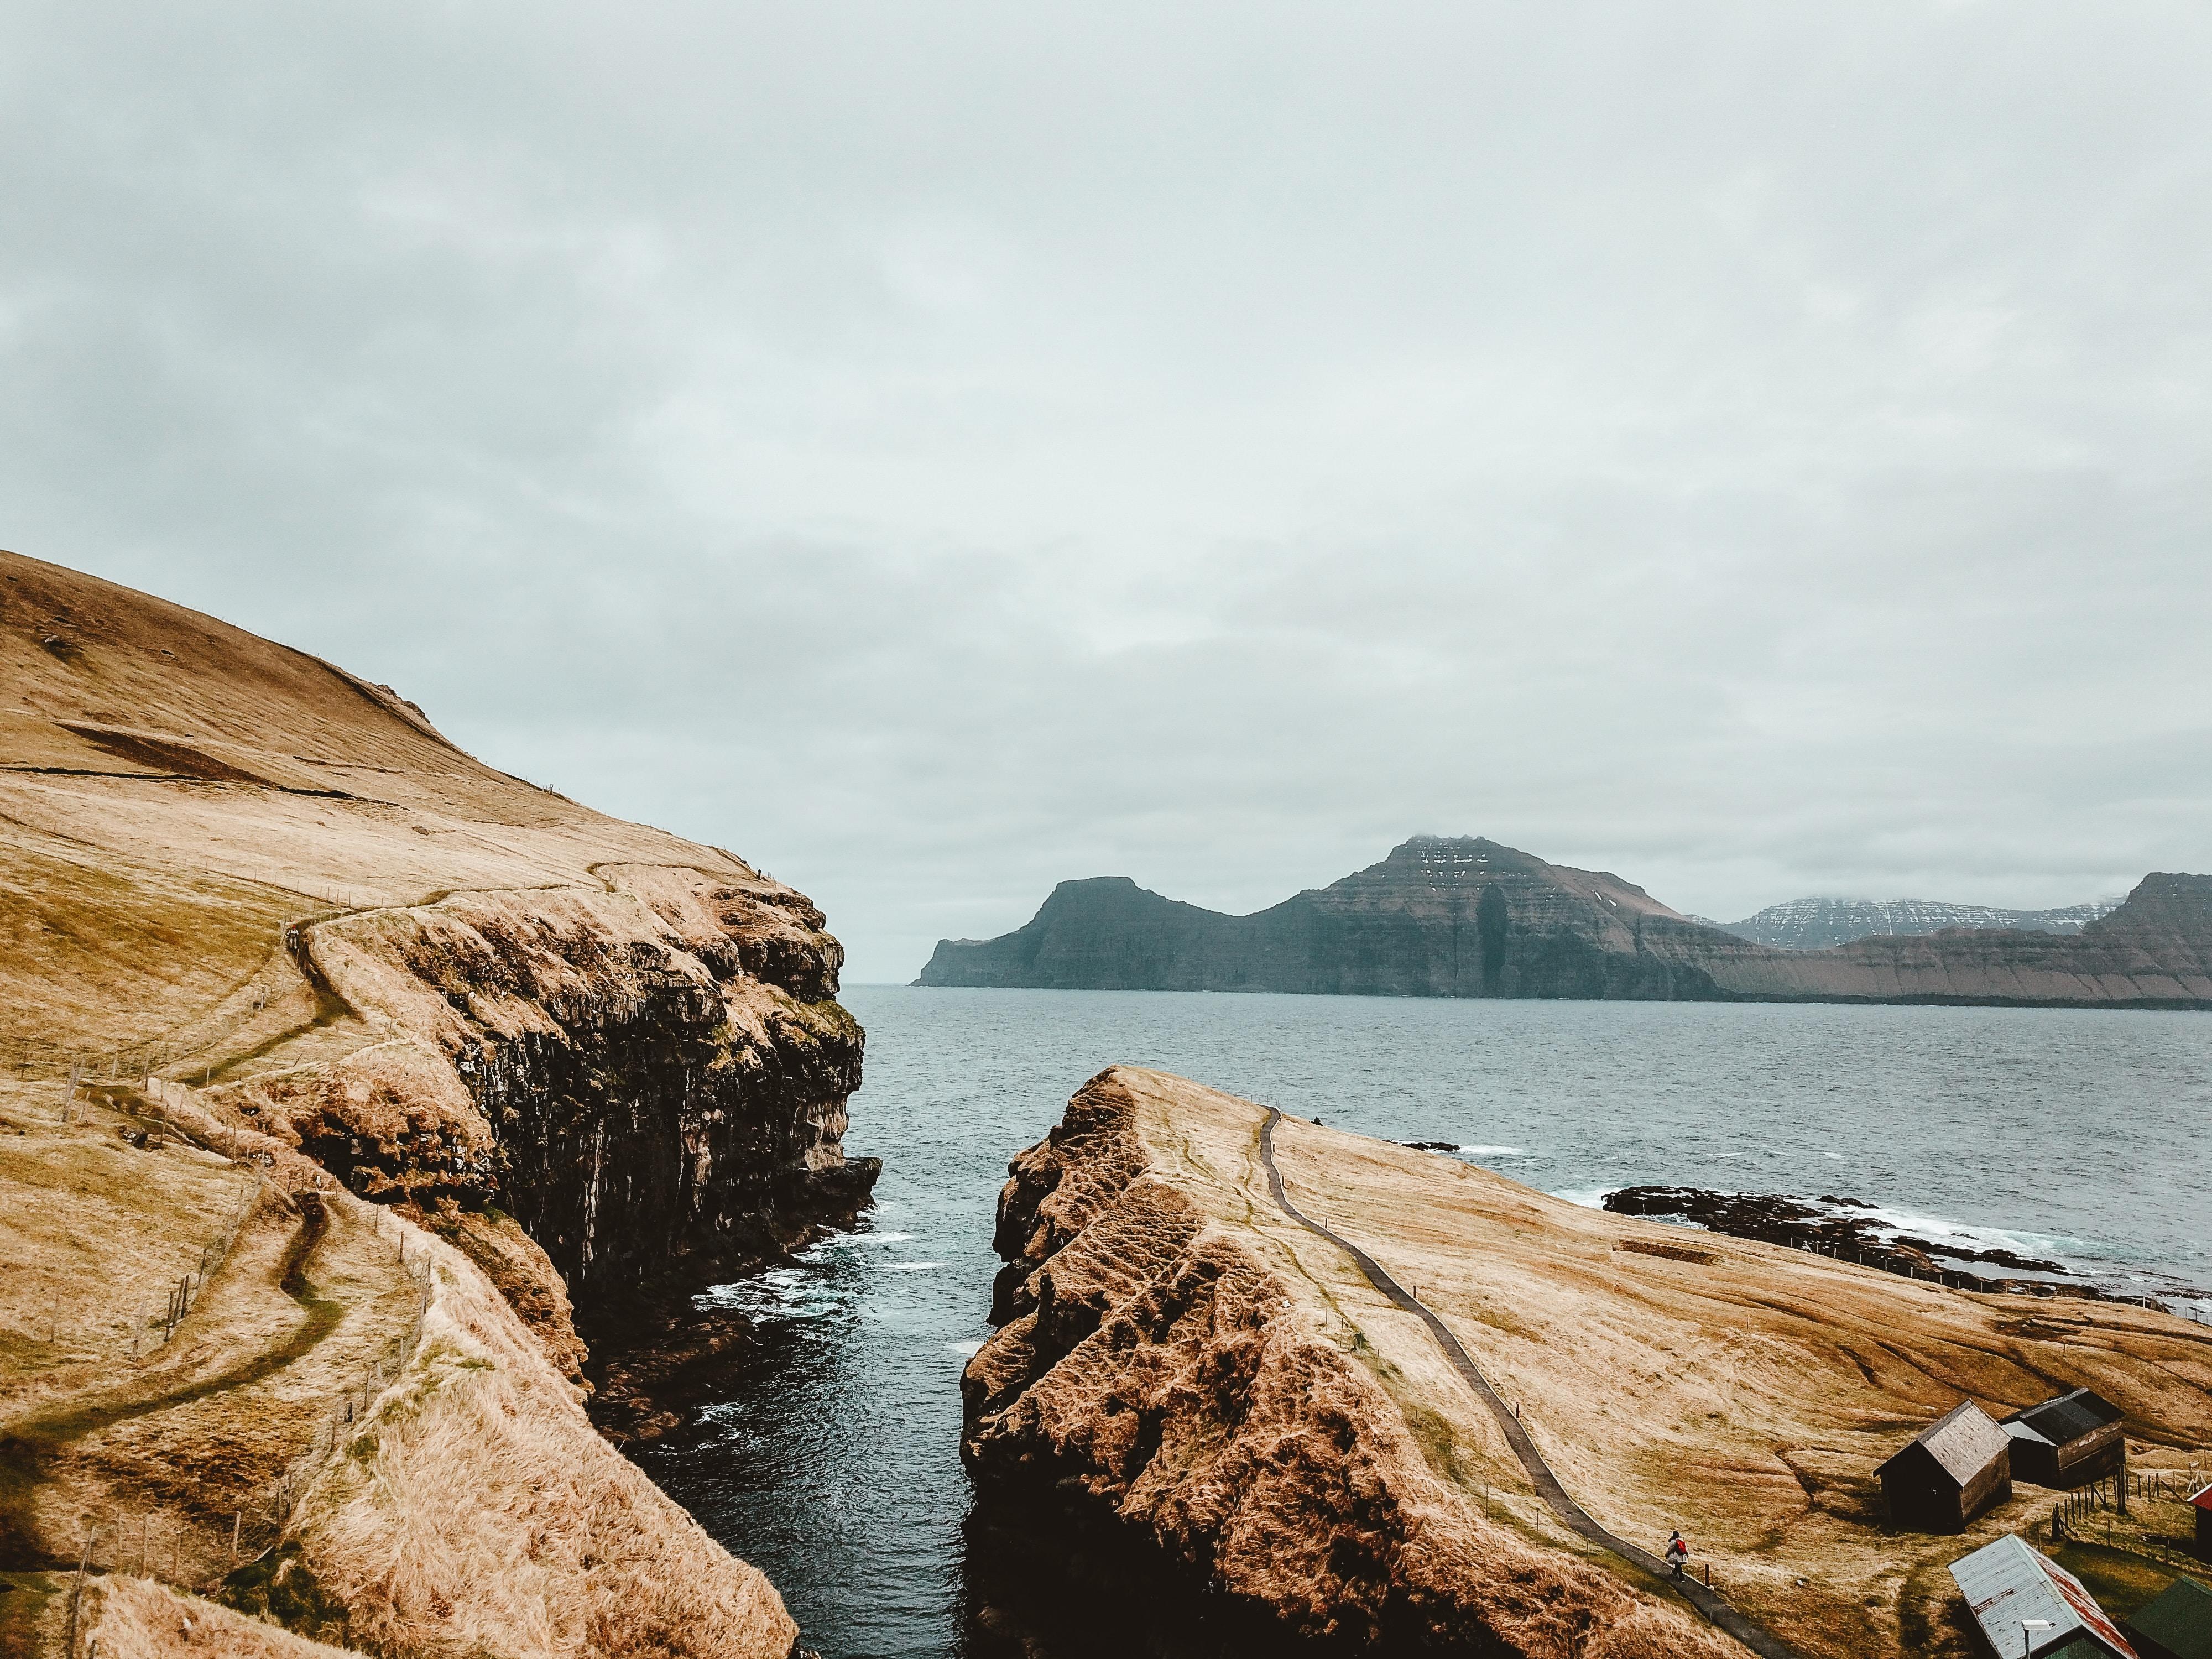 brown rock formation near body of water under blue sky